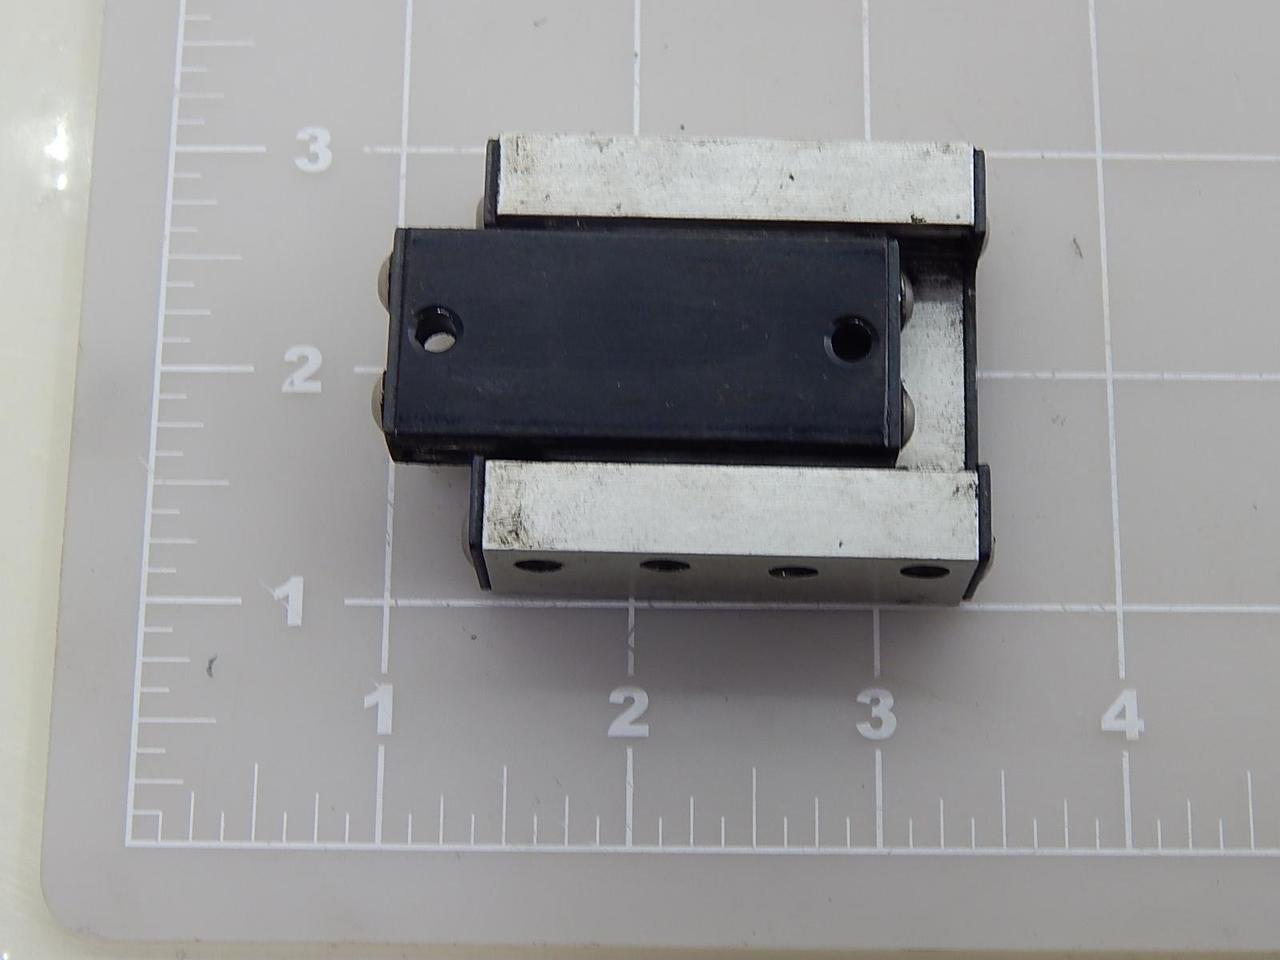 26.9 mm x 40 mm 19 mm Travel Crossed Roller Slide Assemblies Inc Del-Tron Precision Metric